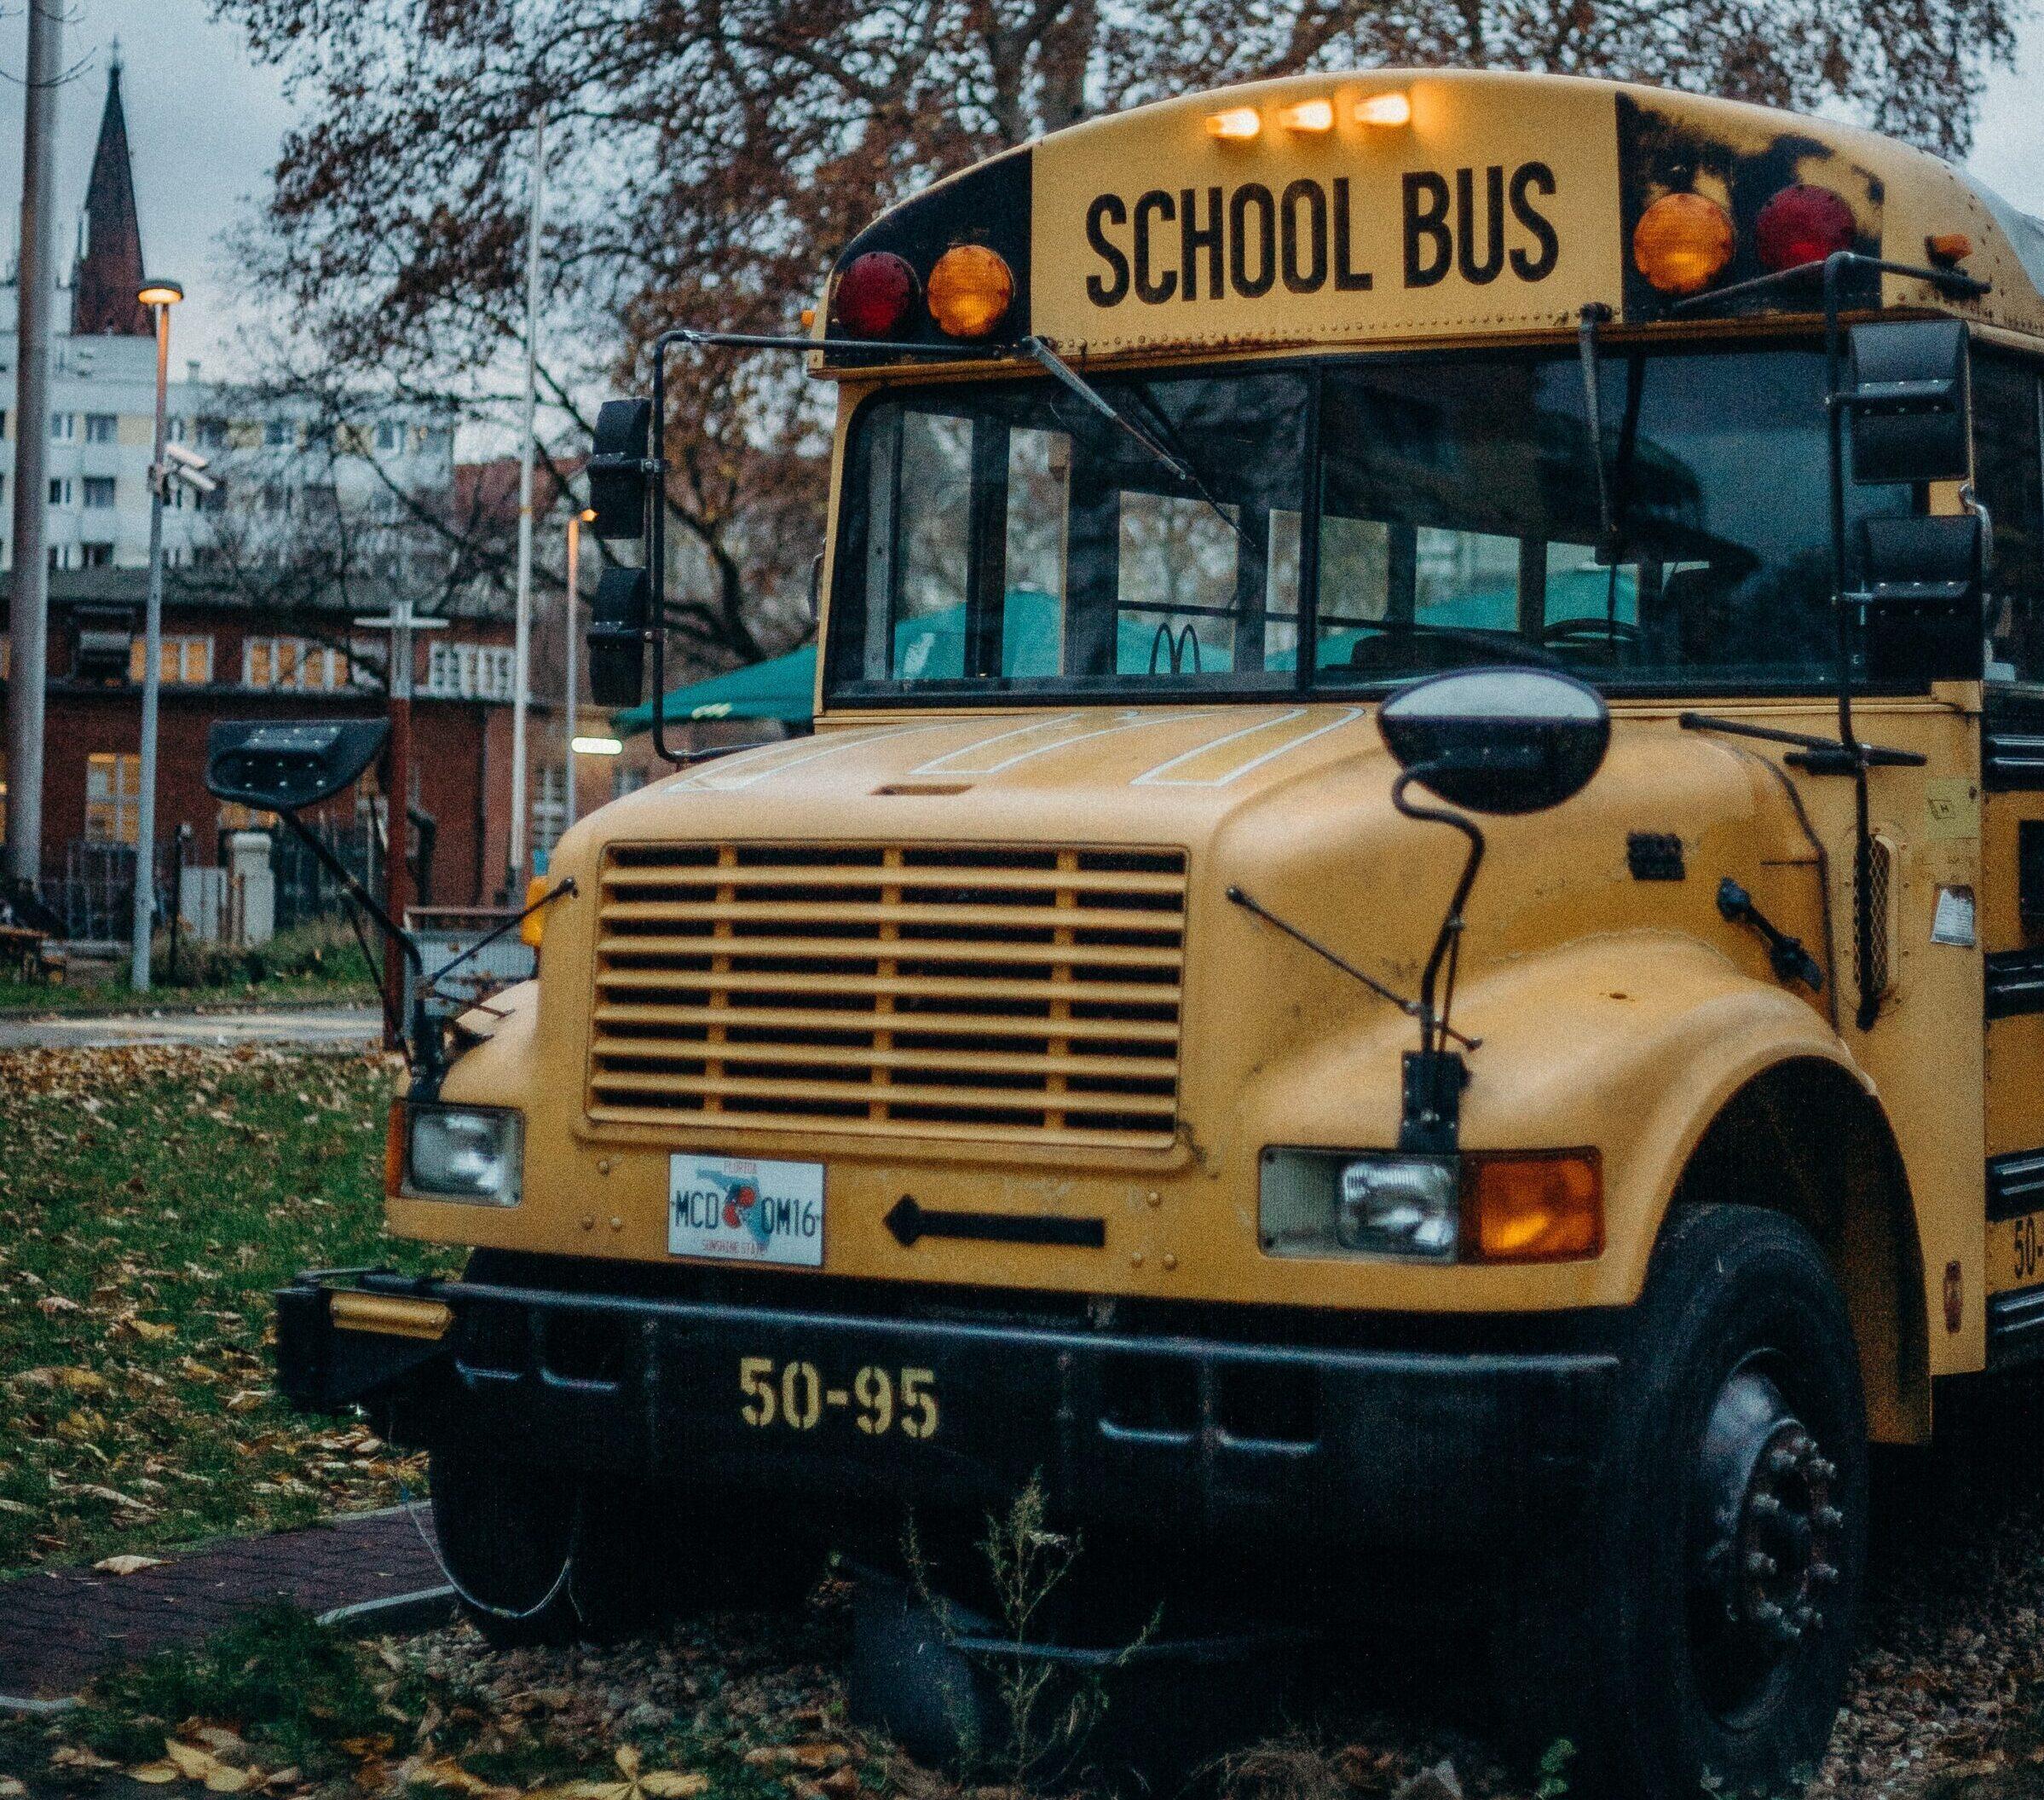 School bus parked by school